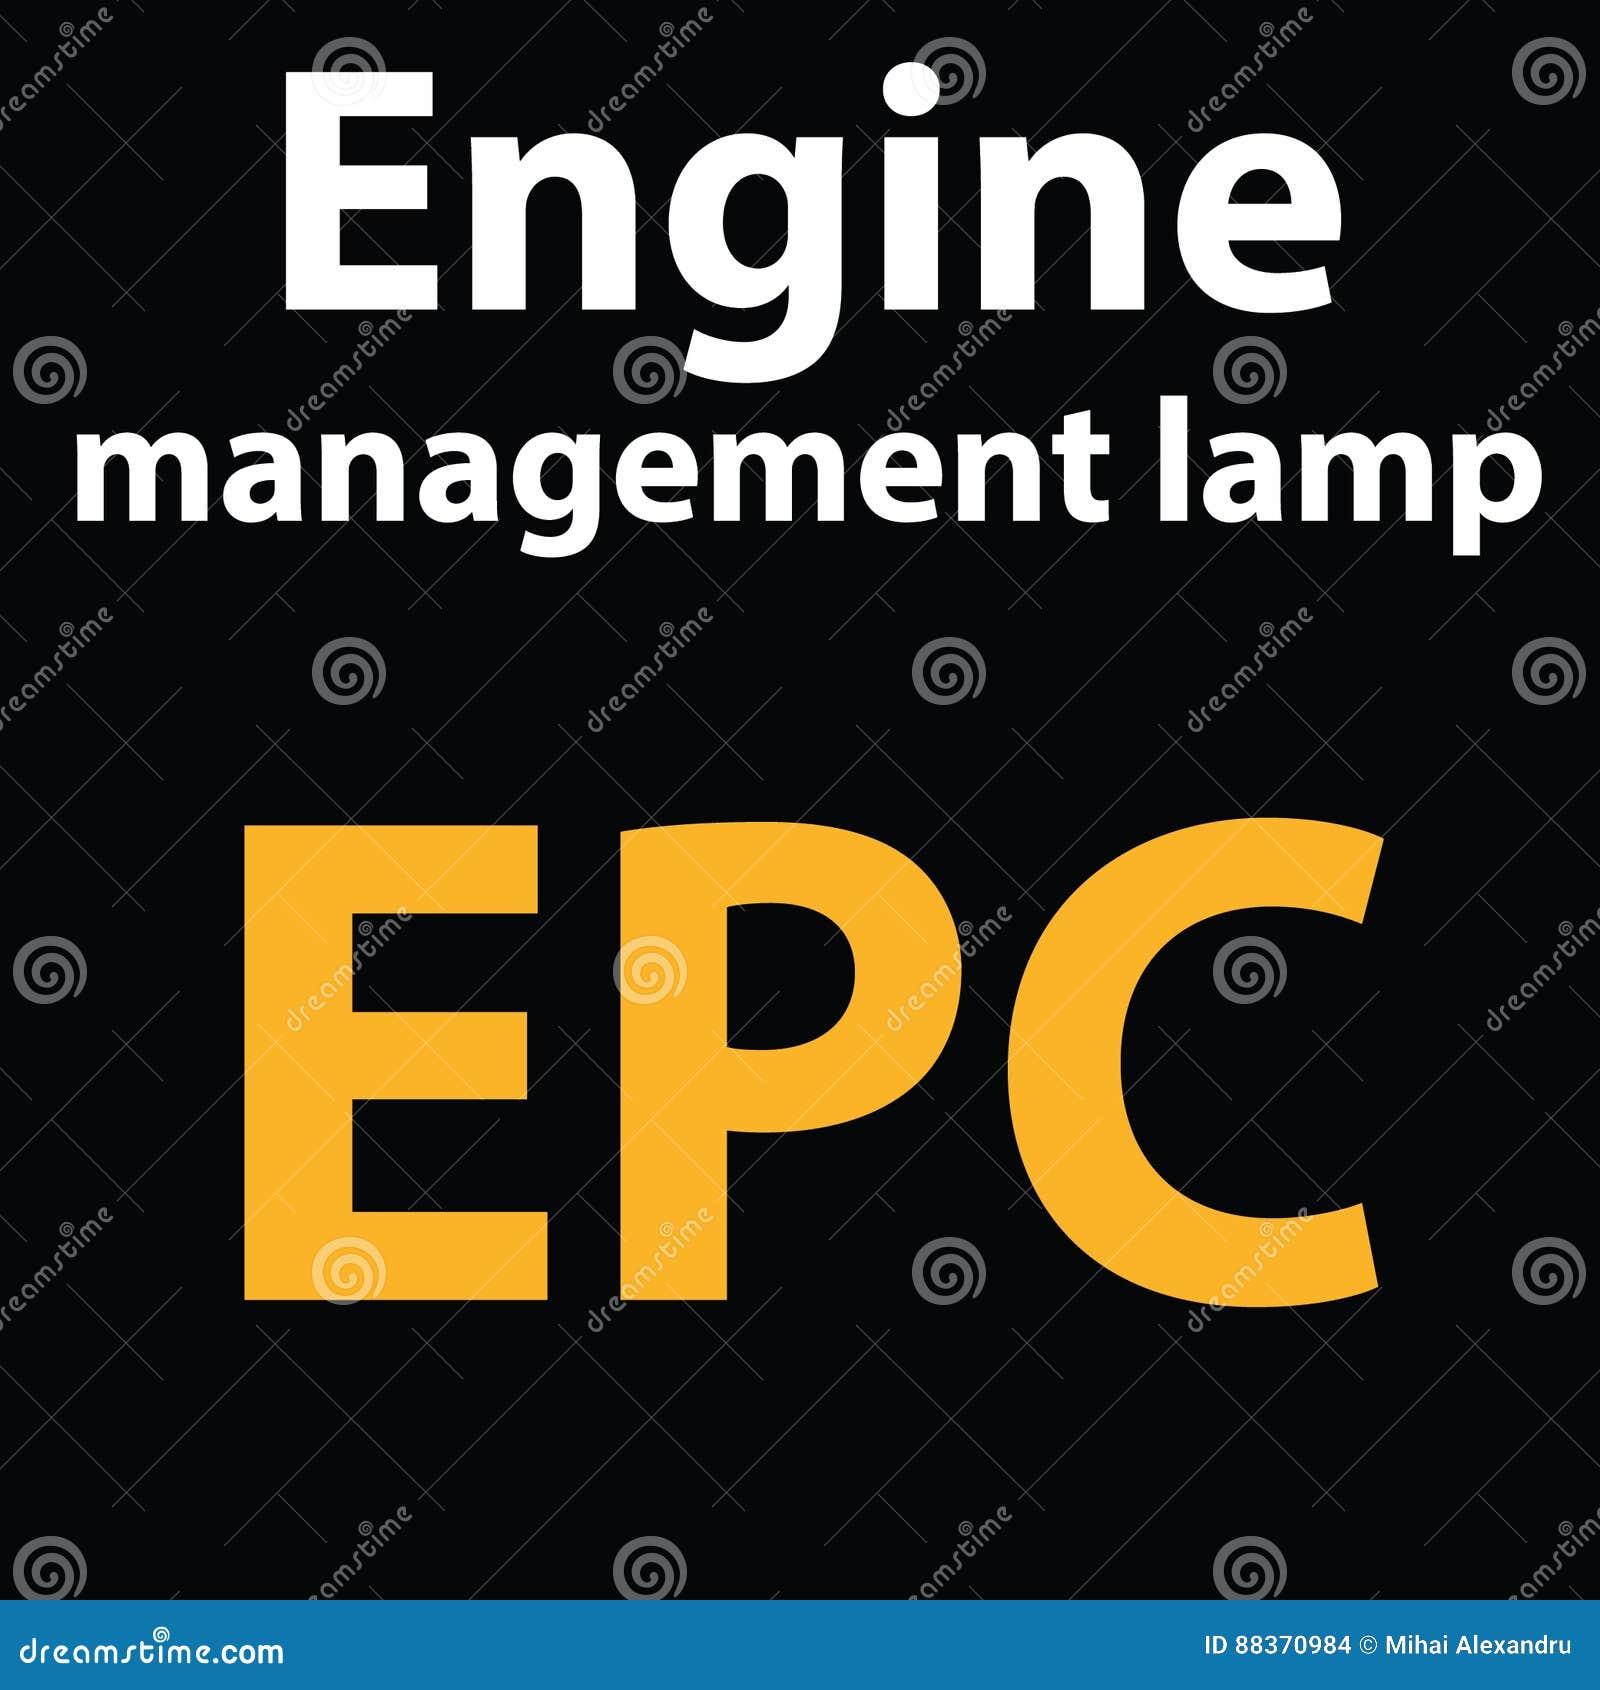 Warning Dashboard Light EPC. DTC Code Engine Management